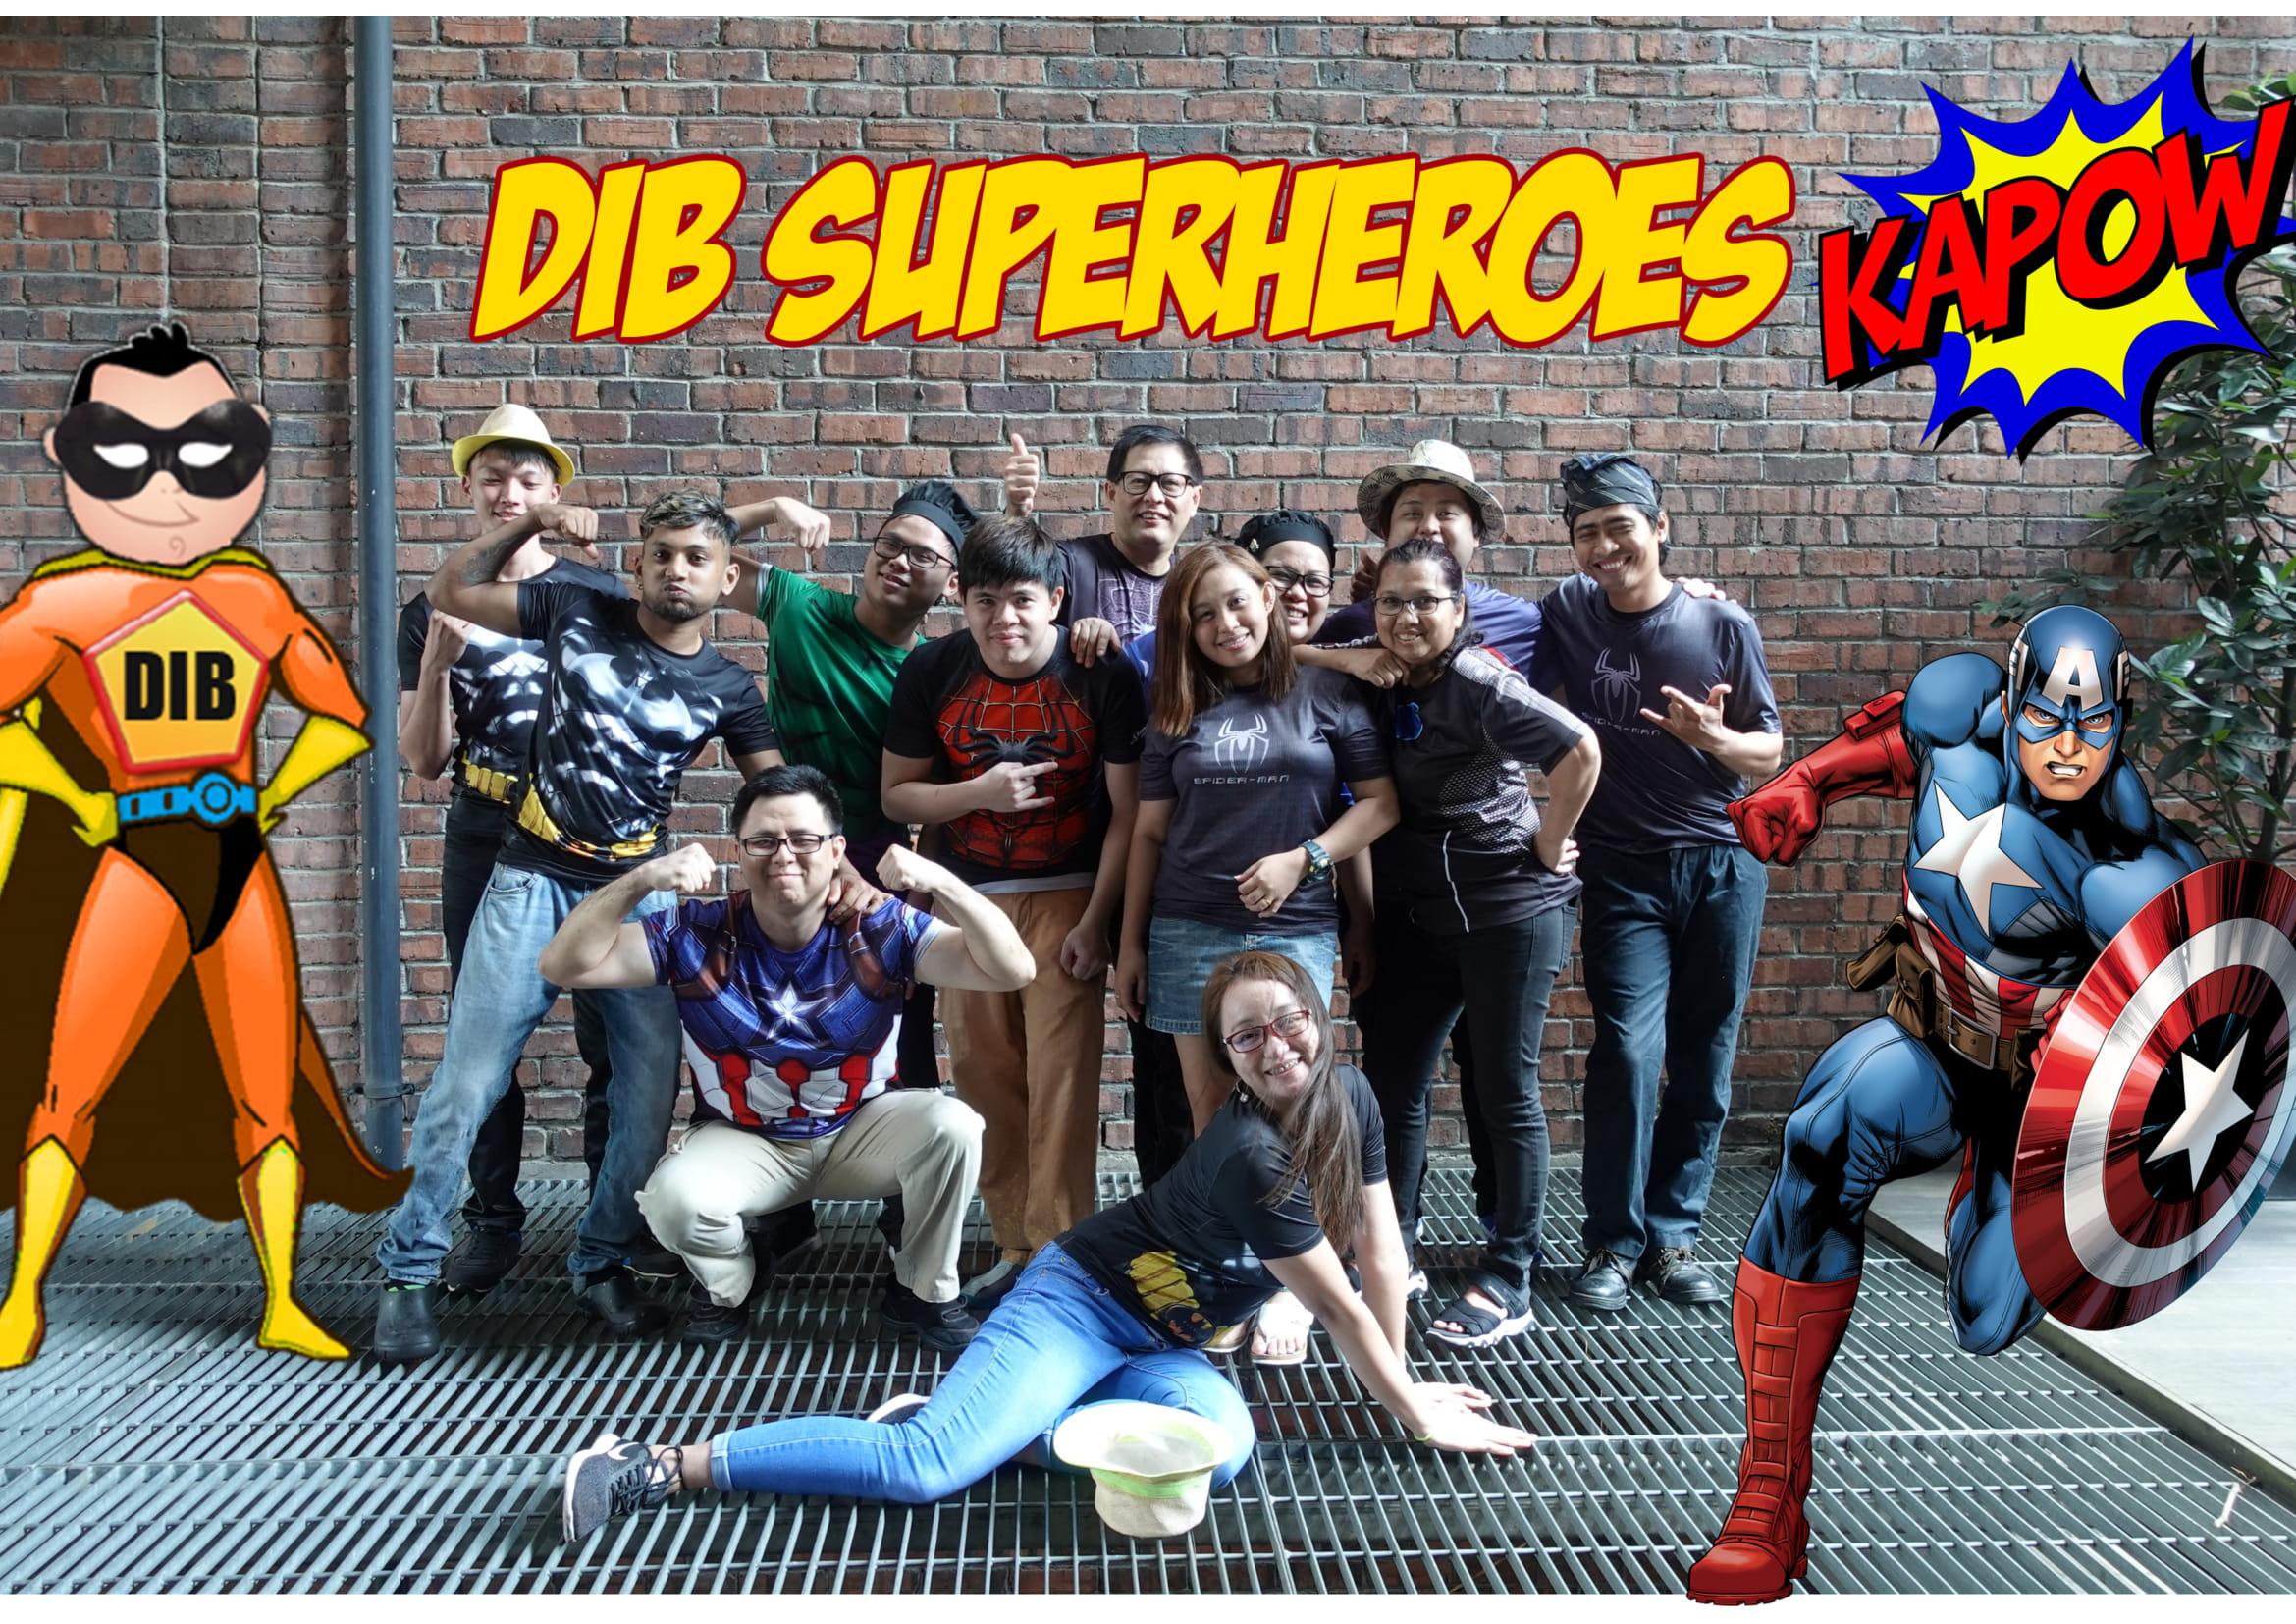 DIB SUPERHEROES-1